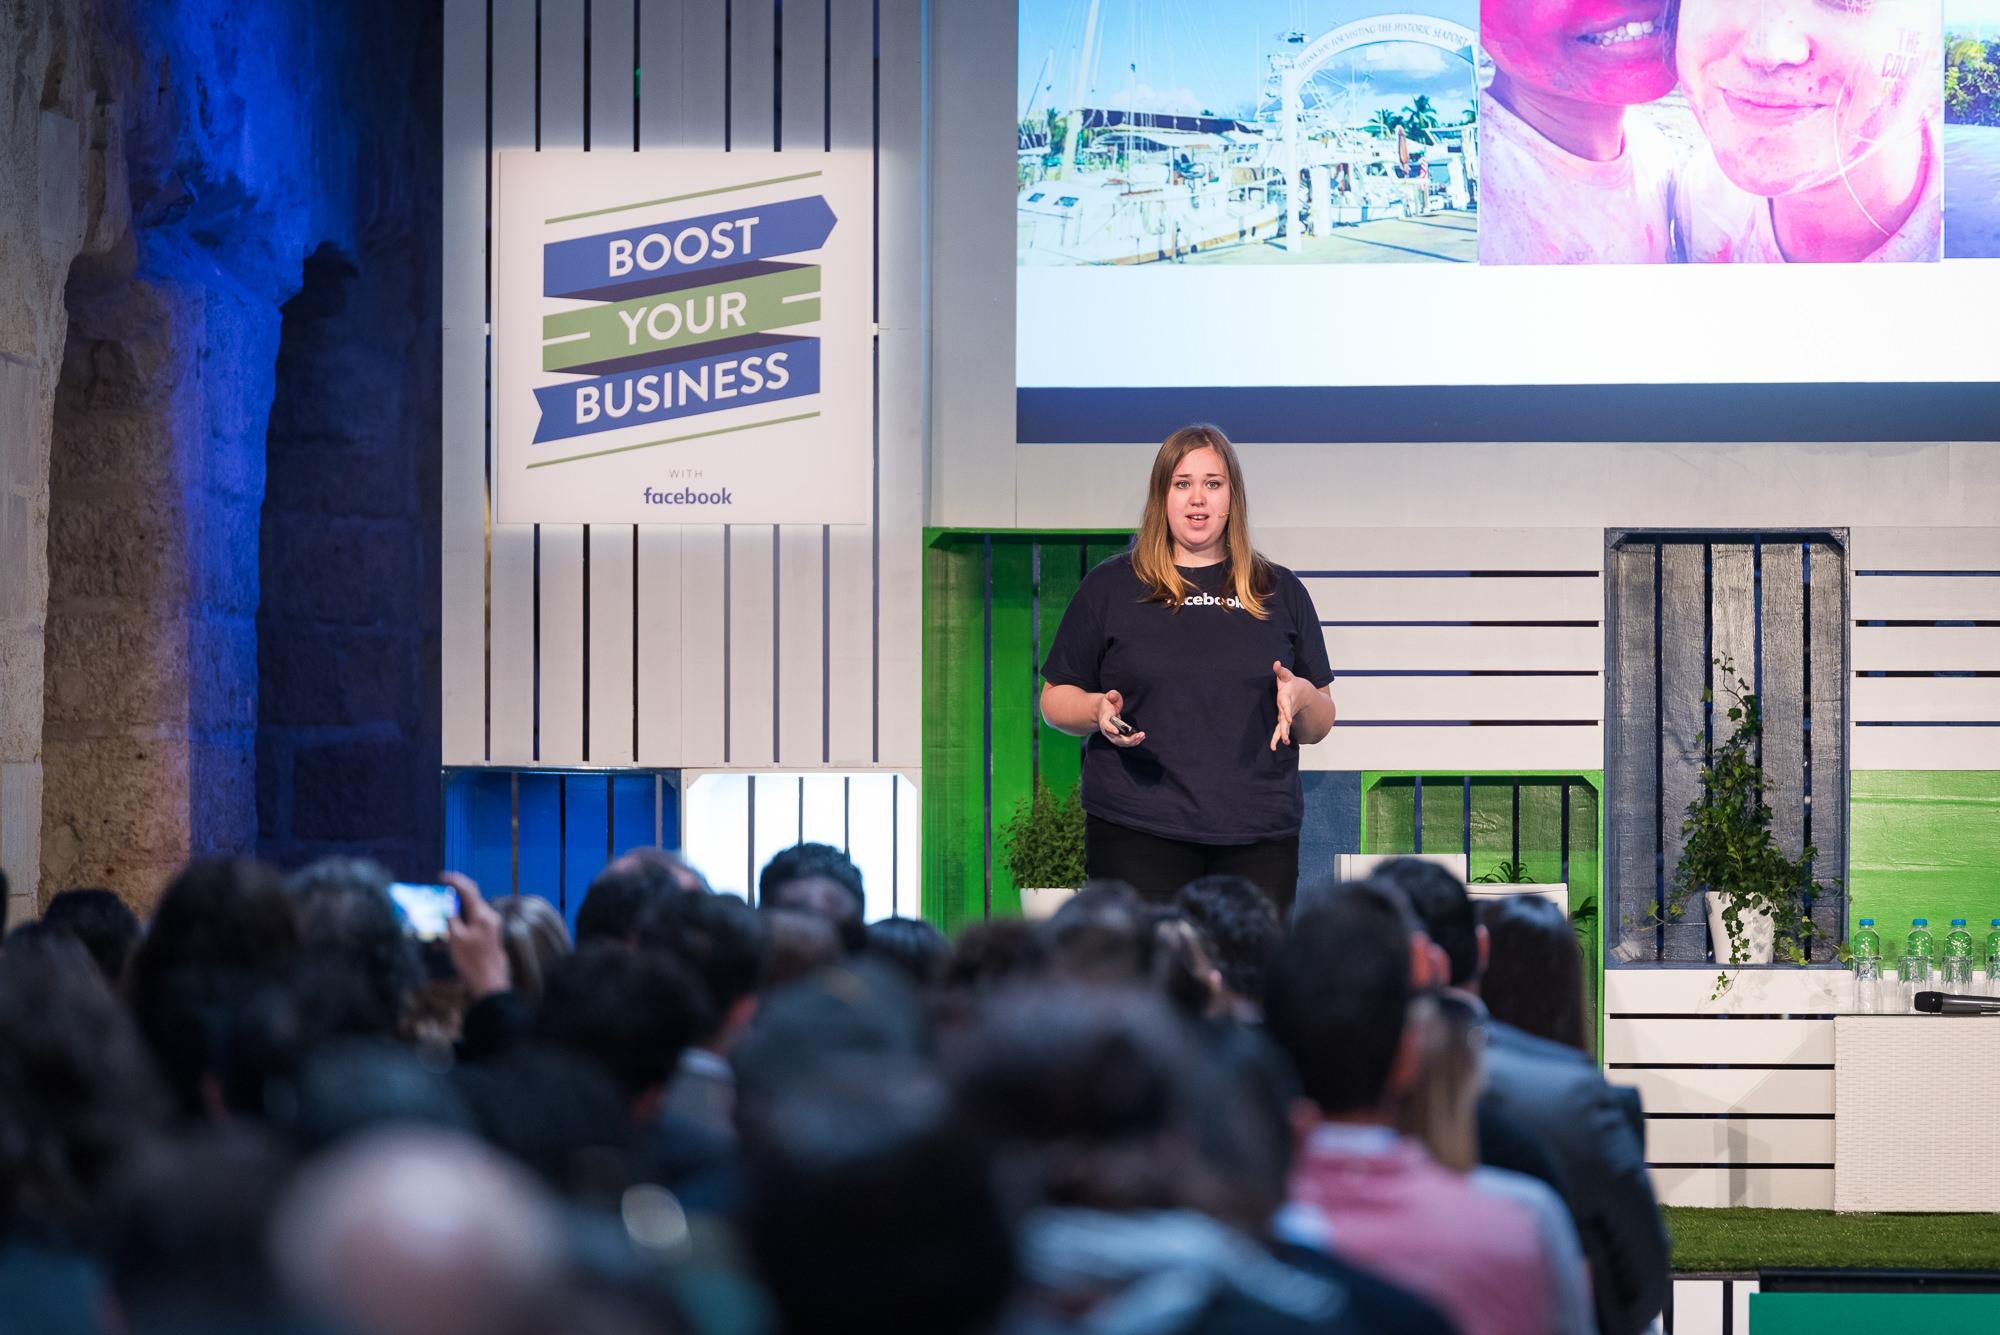 facebook-boost-your-business-gruppo-peroni-eventi-08